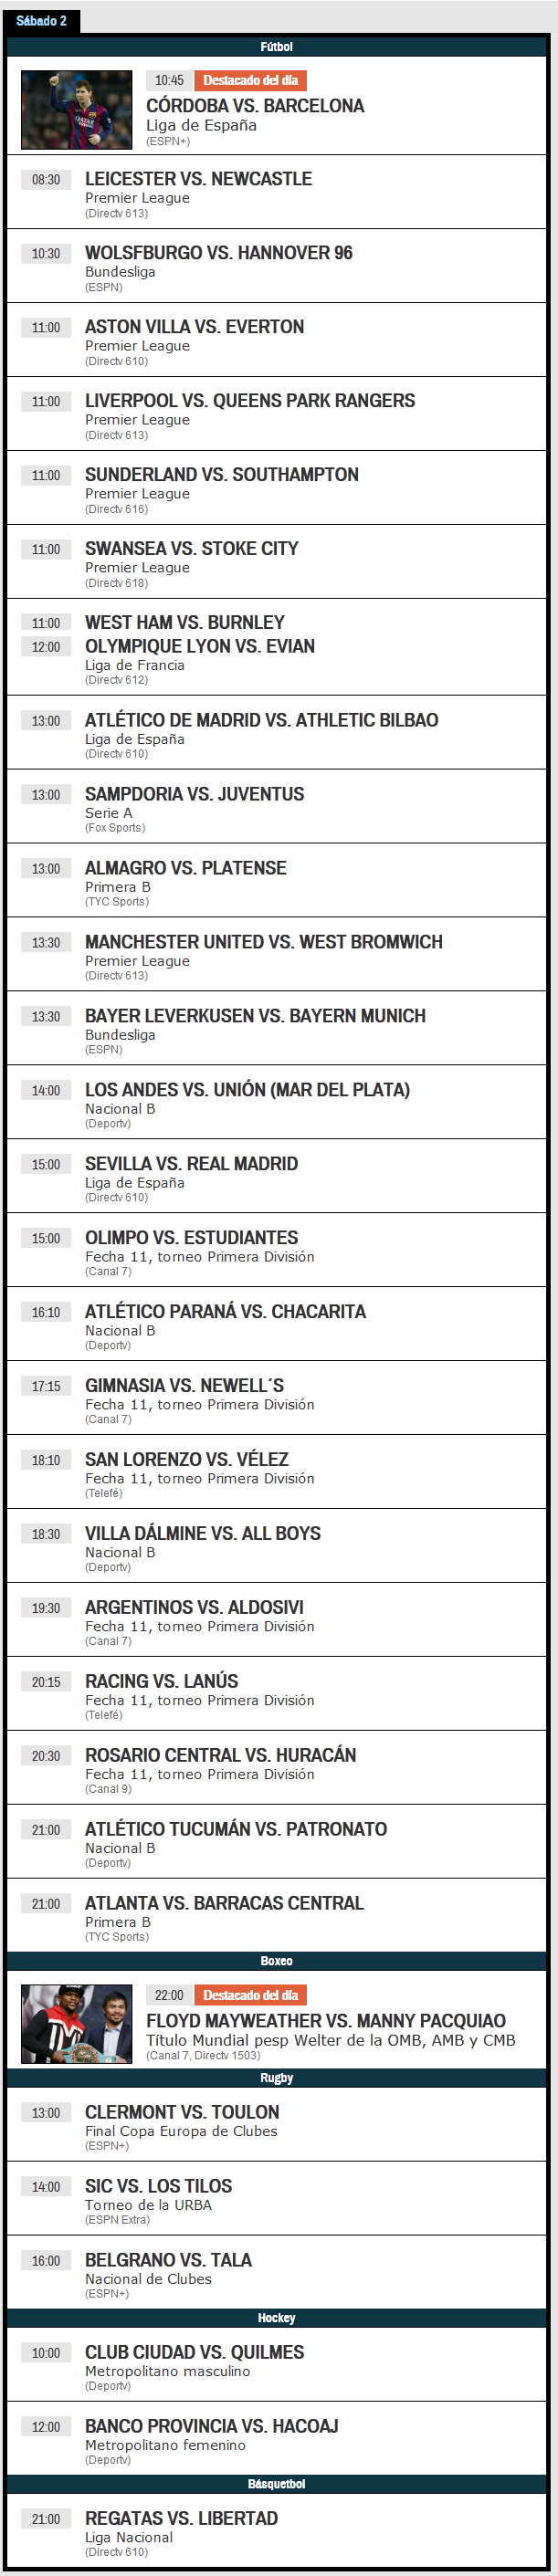 agenda_deportiva_02-05-2015_v1